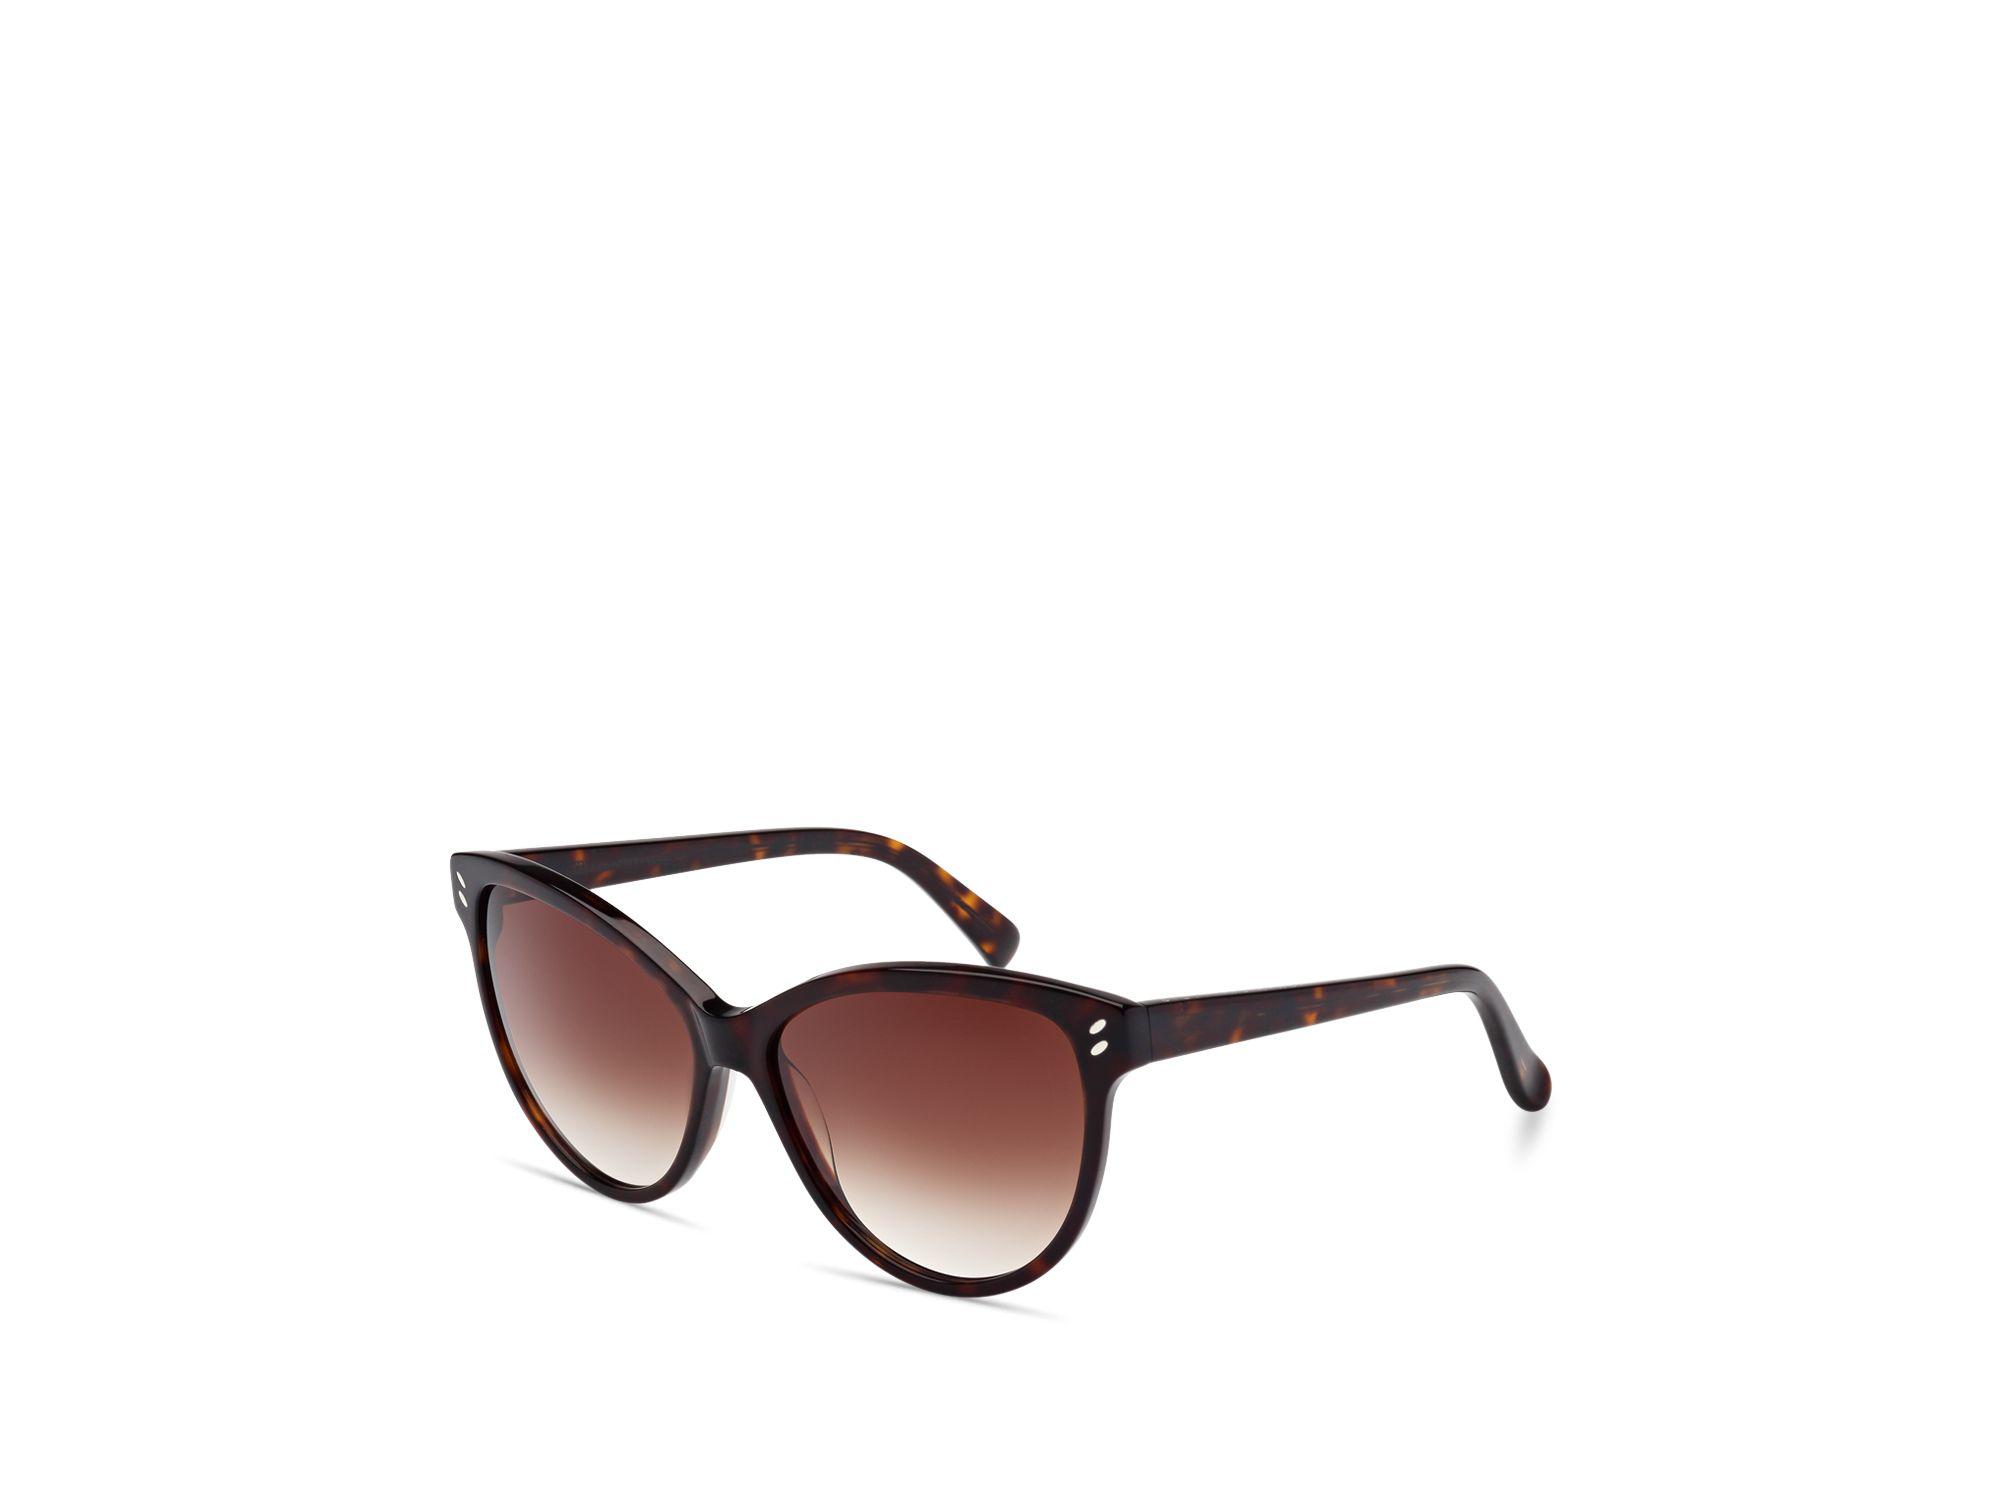 9519ce8ed0 ... cat sunglasses